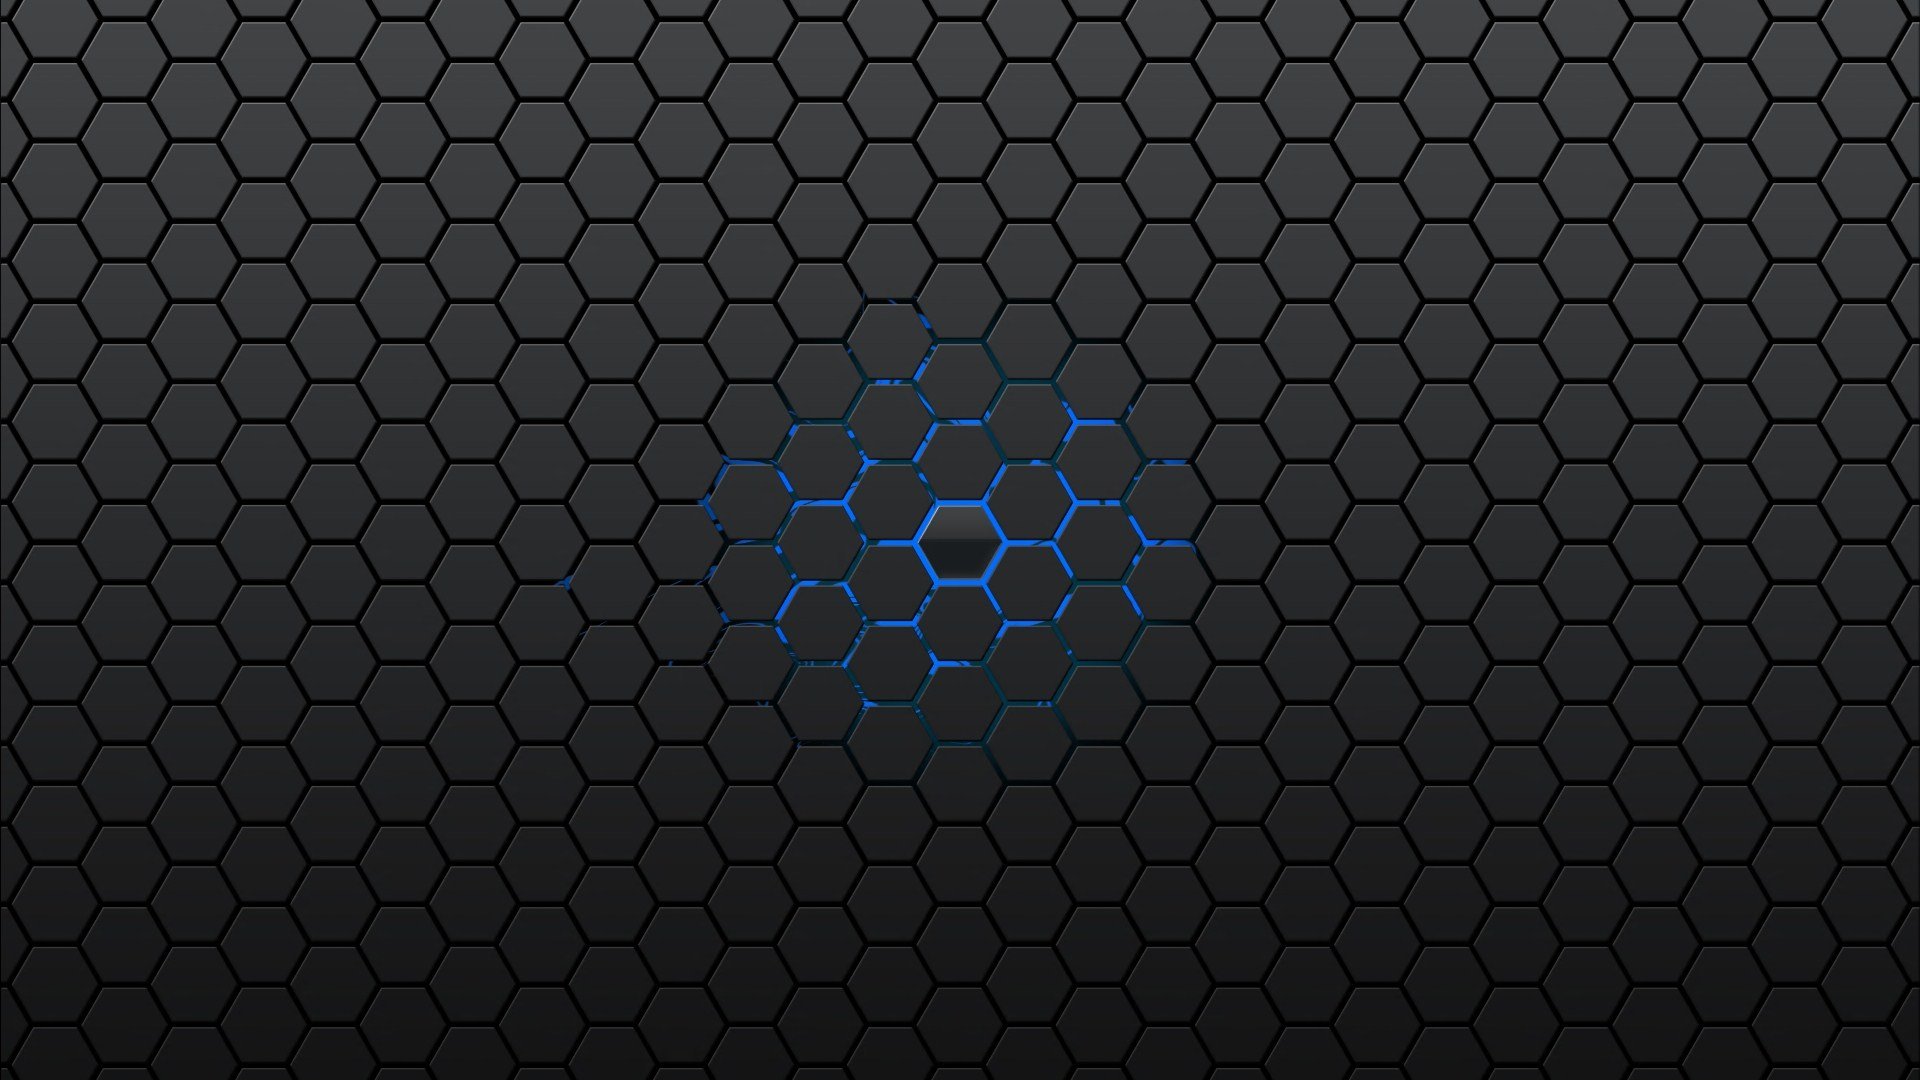 Honeycomb Grey pattern wallpapers Wide Screen Wallpaper 1080p2K4K 1920x1080